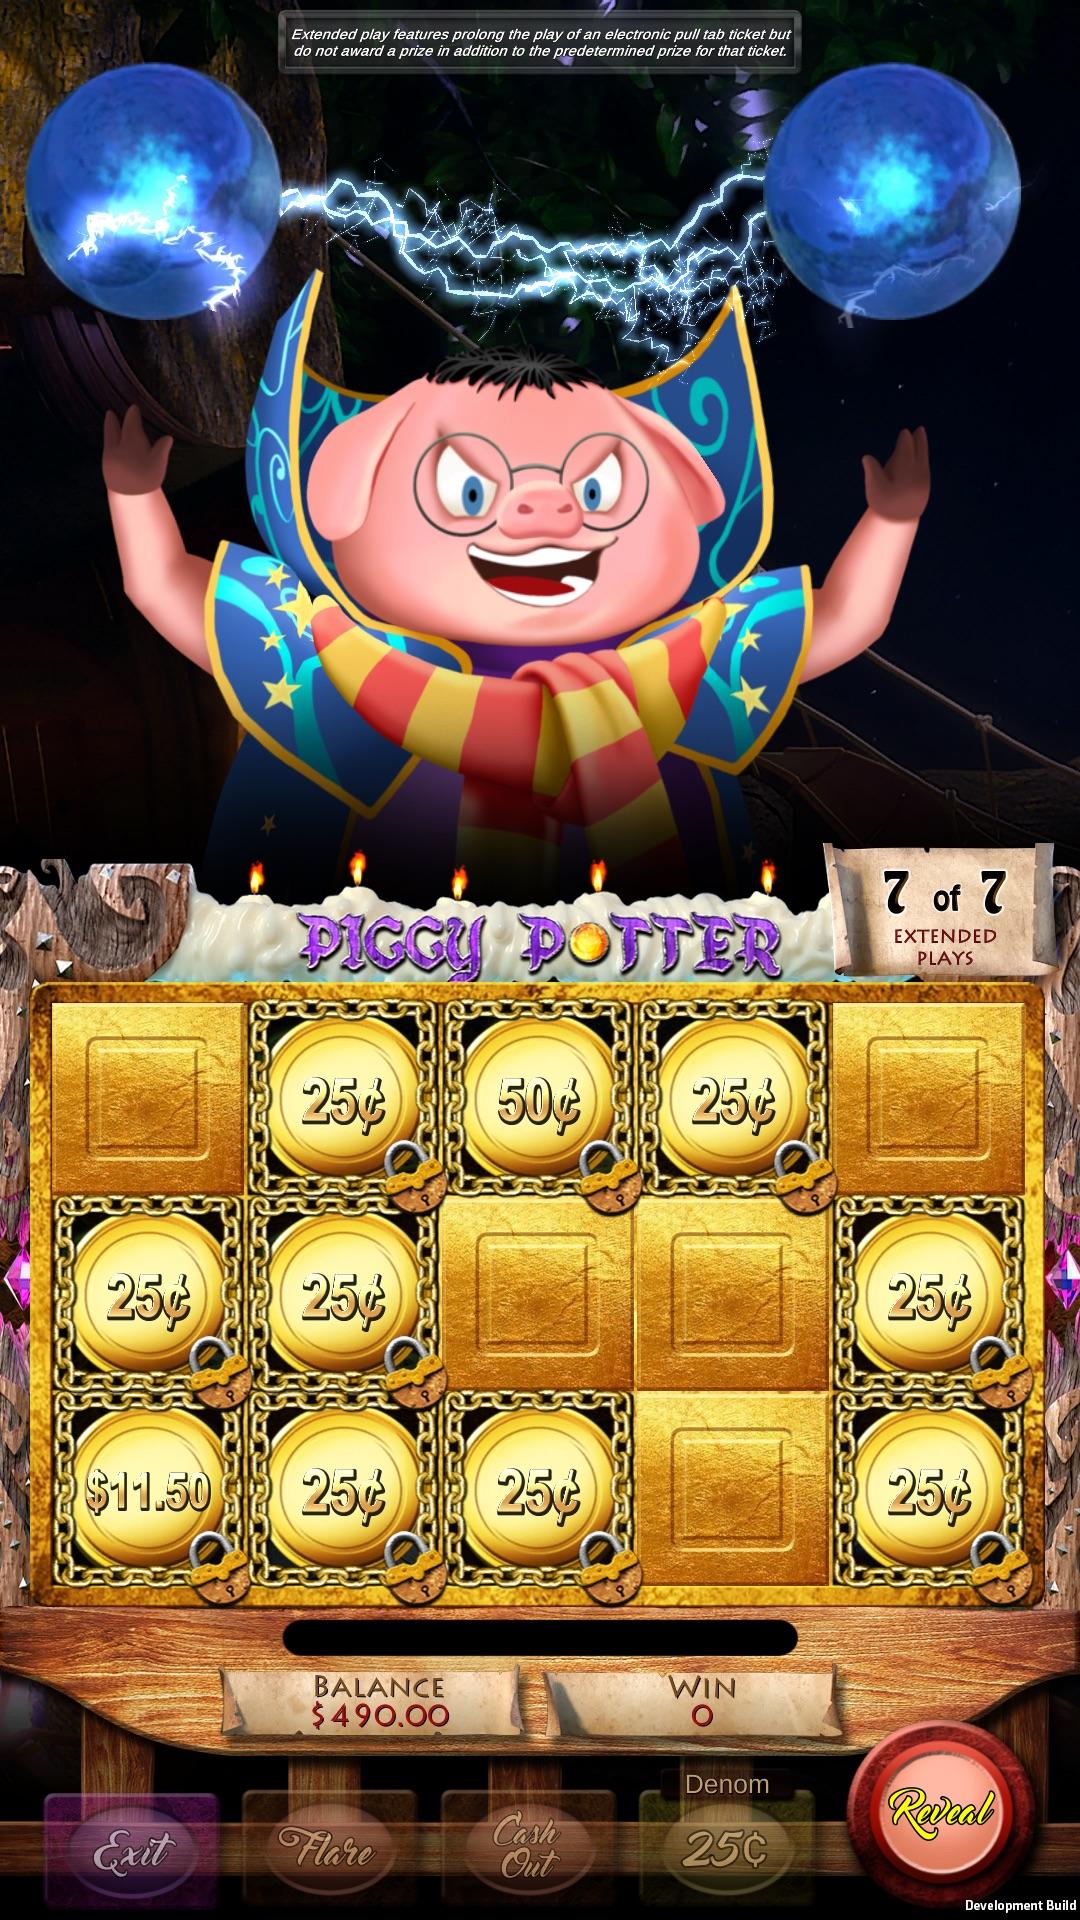 Piggy-Potter-Vertical-pull-tab-game-screen-shot-bonus